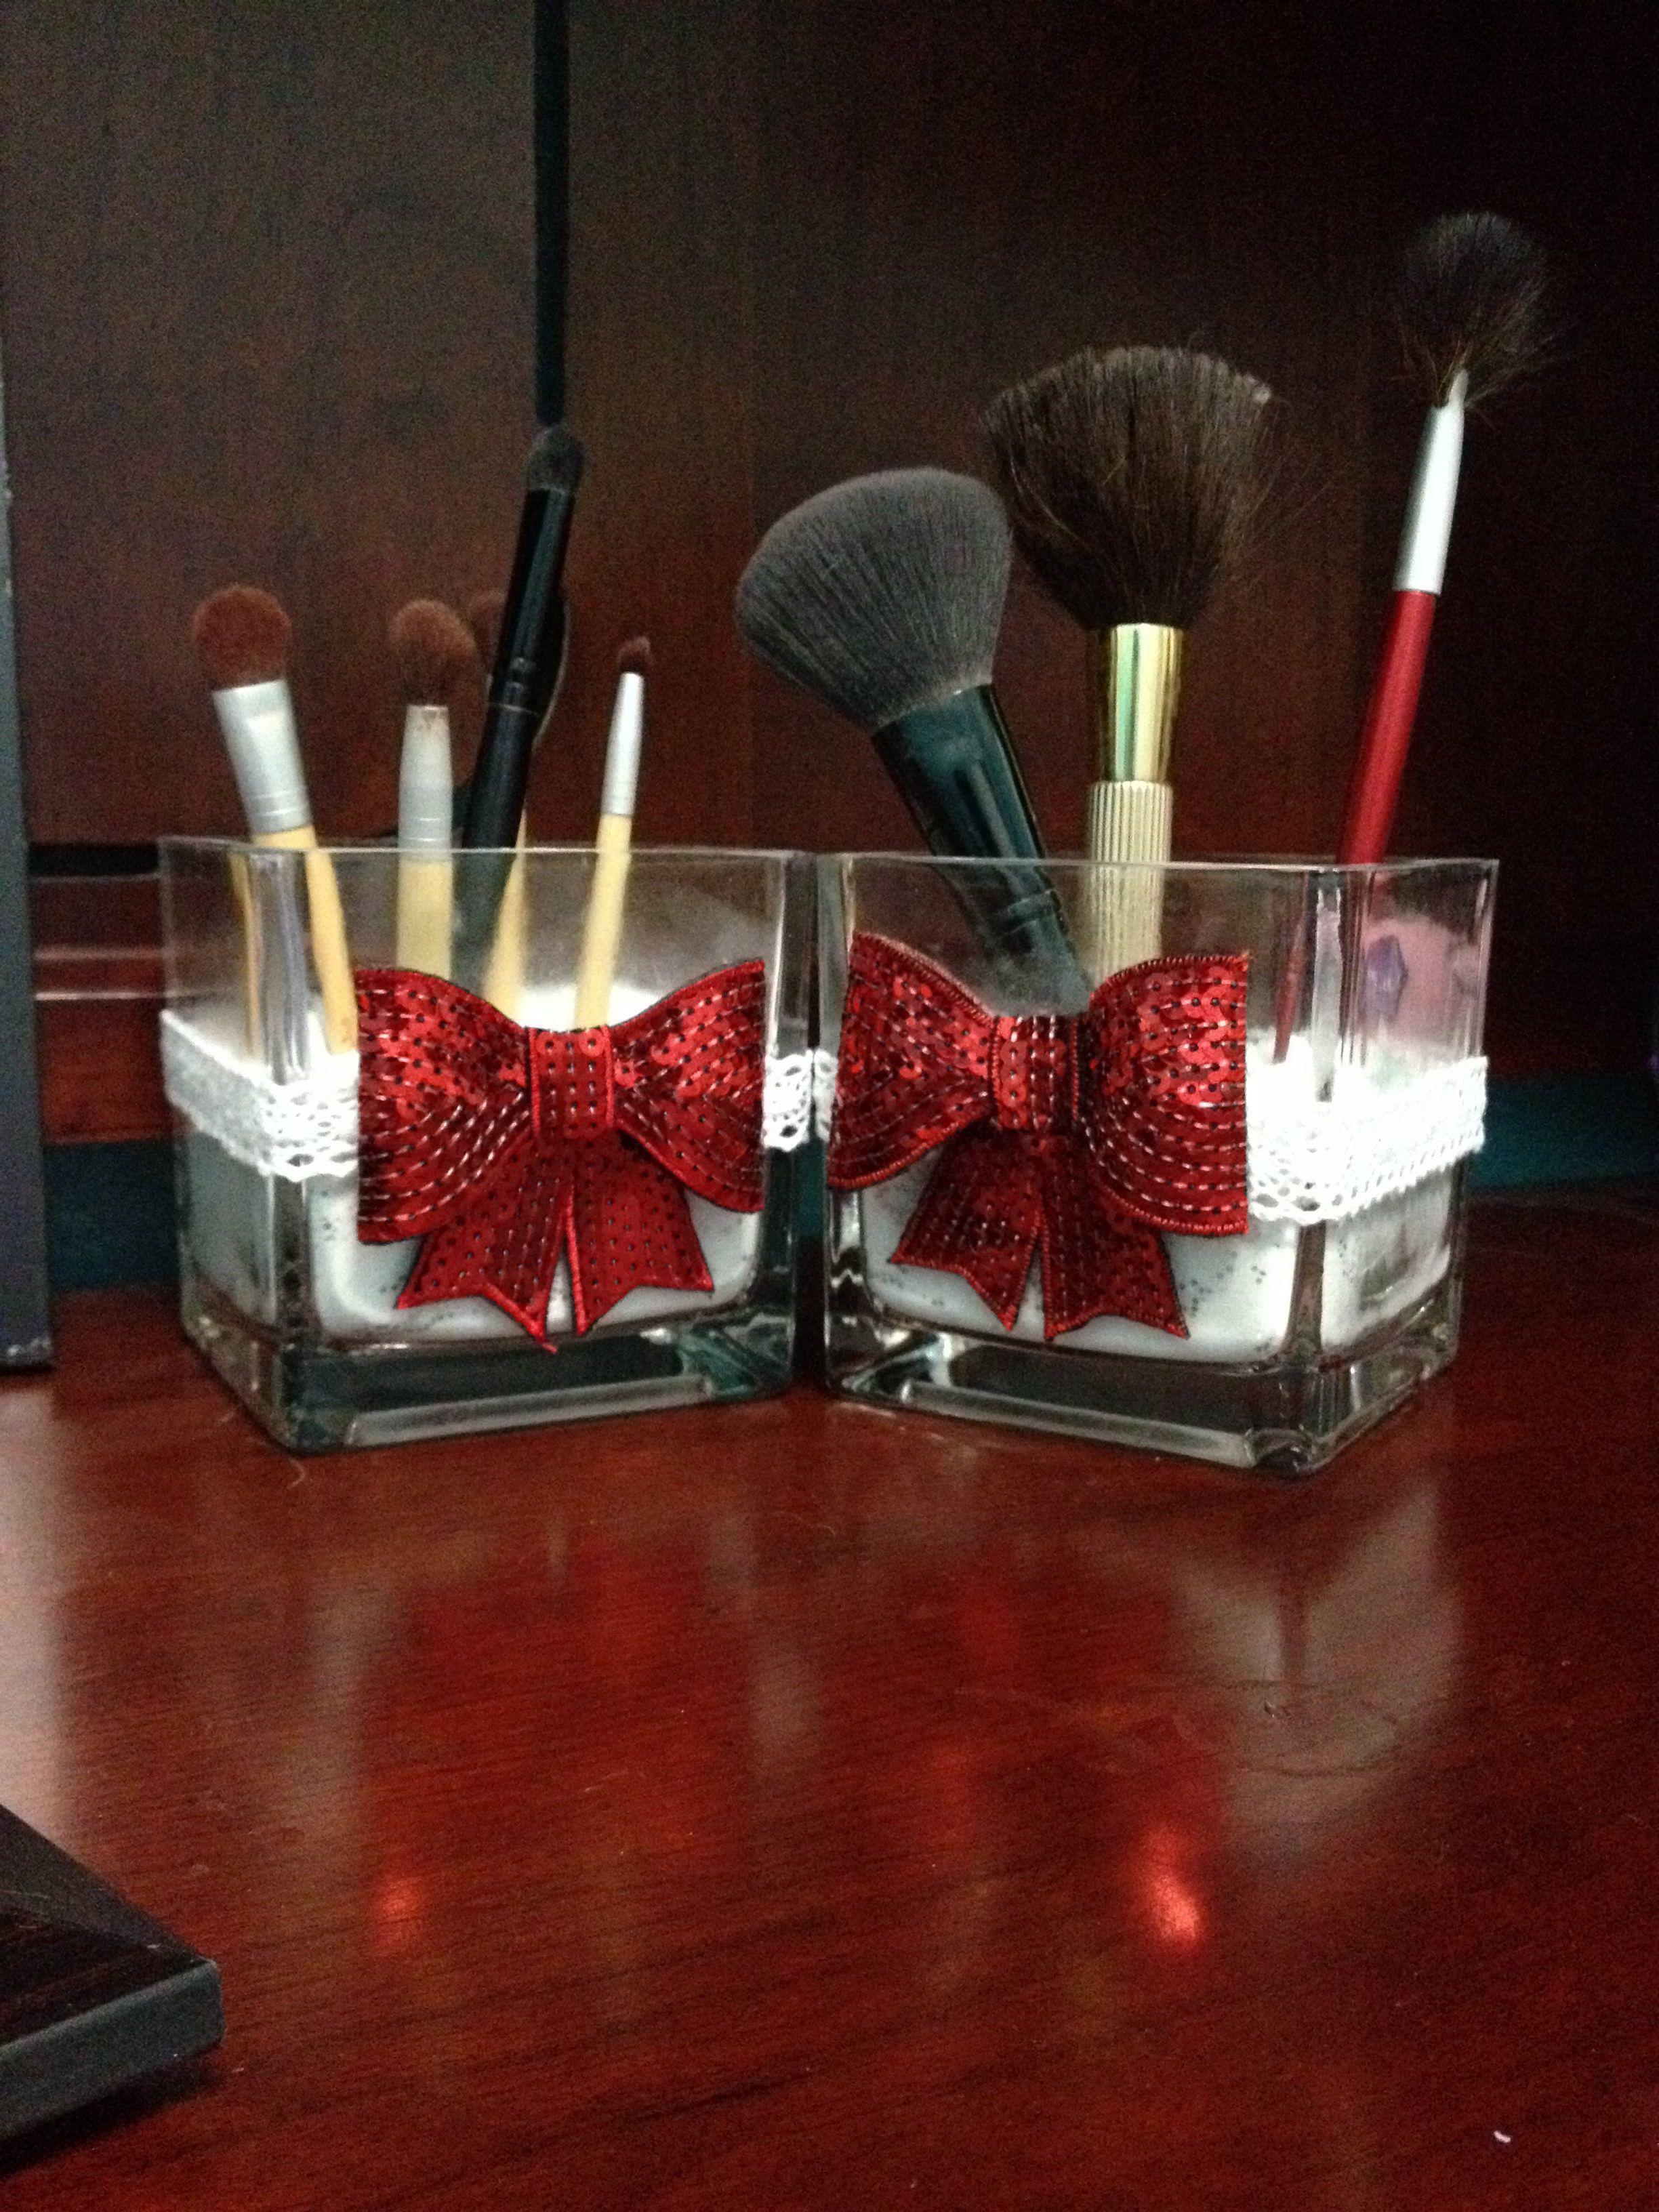 Brush vases. Tooo cute and easy to make ) Makeup